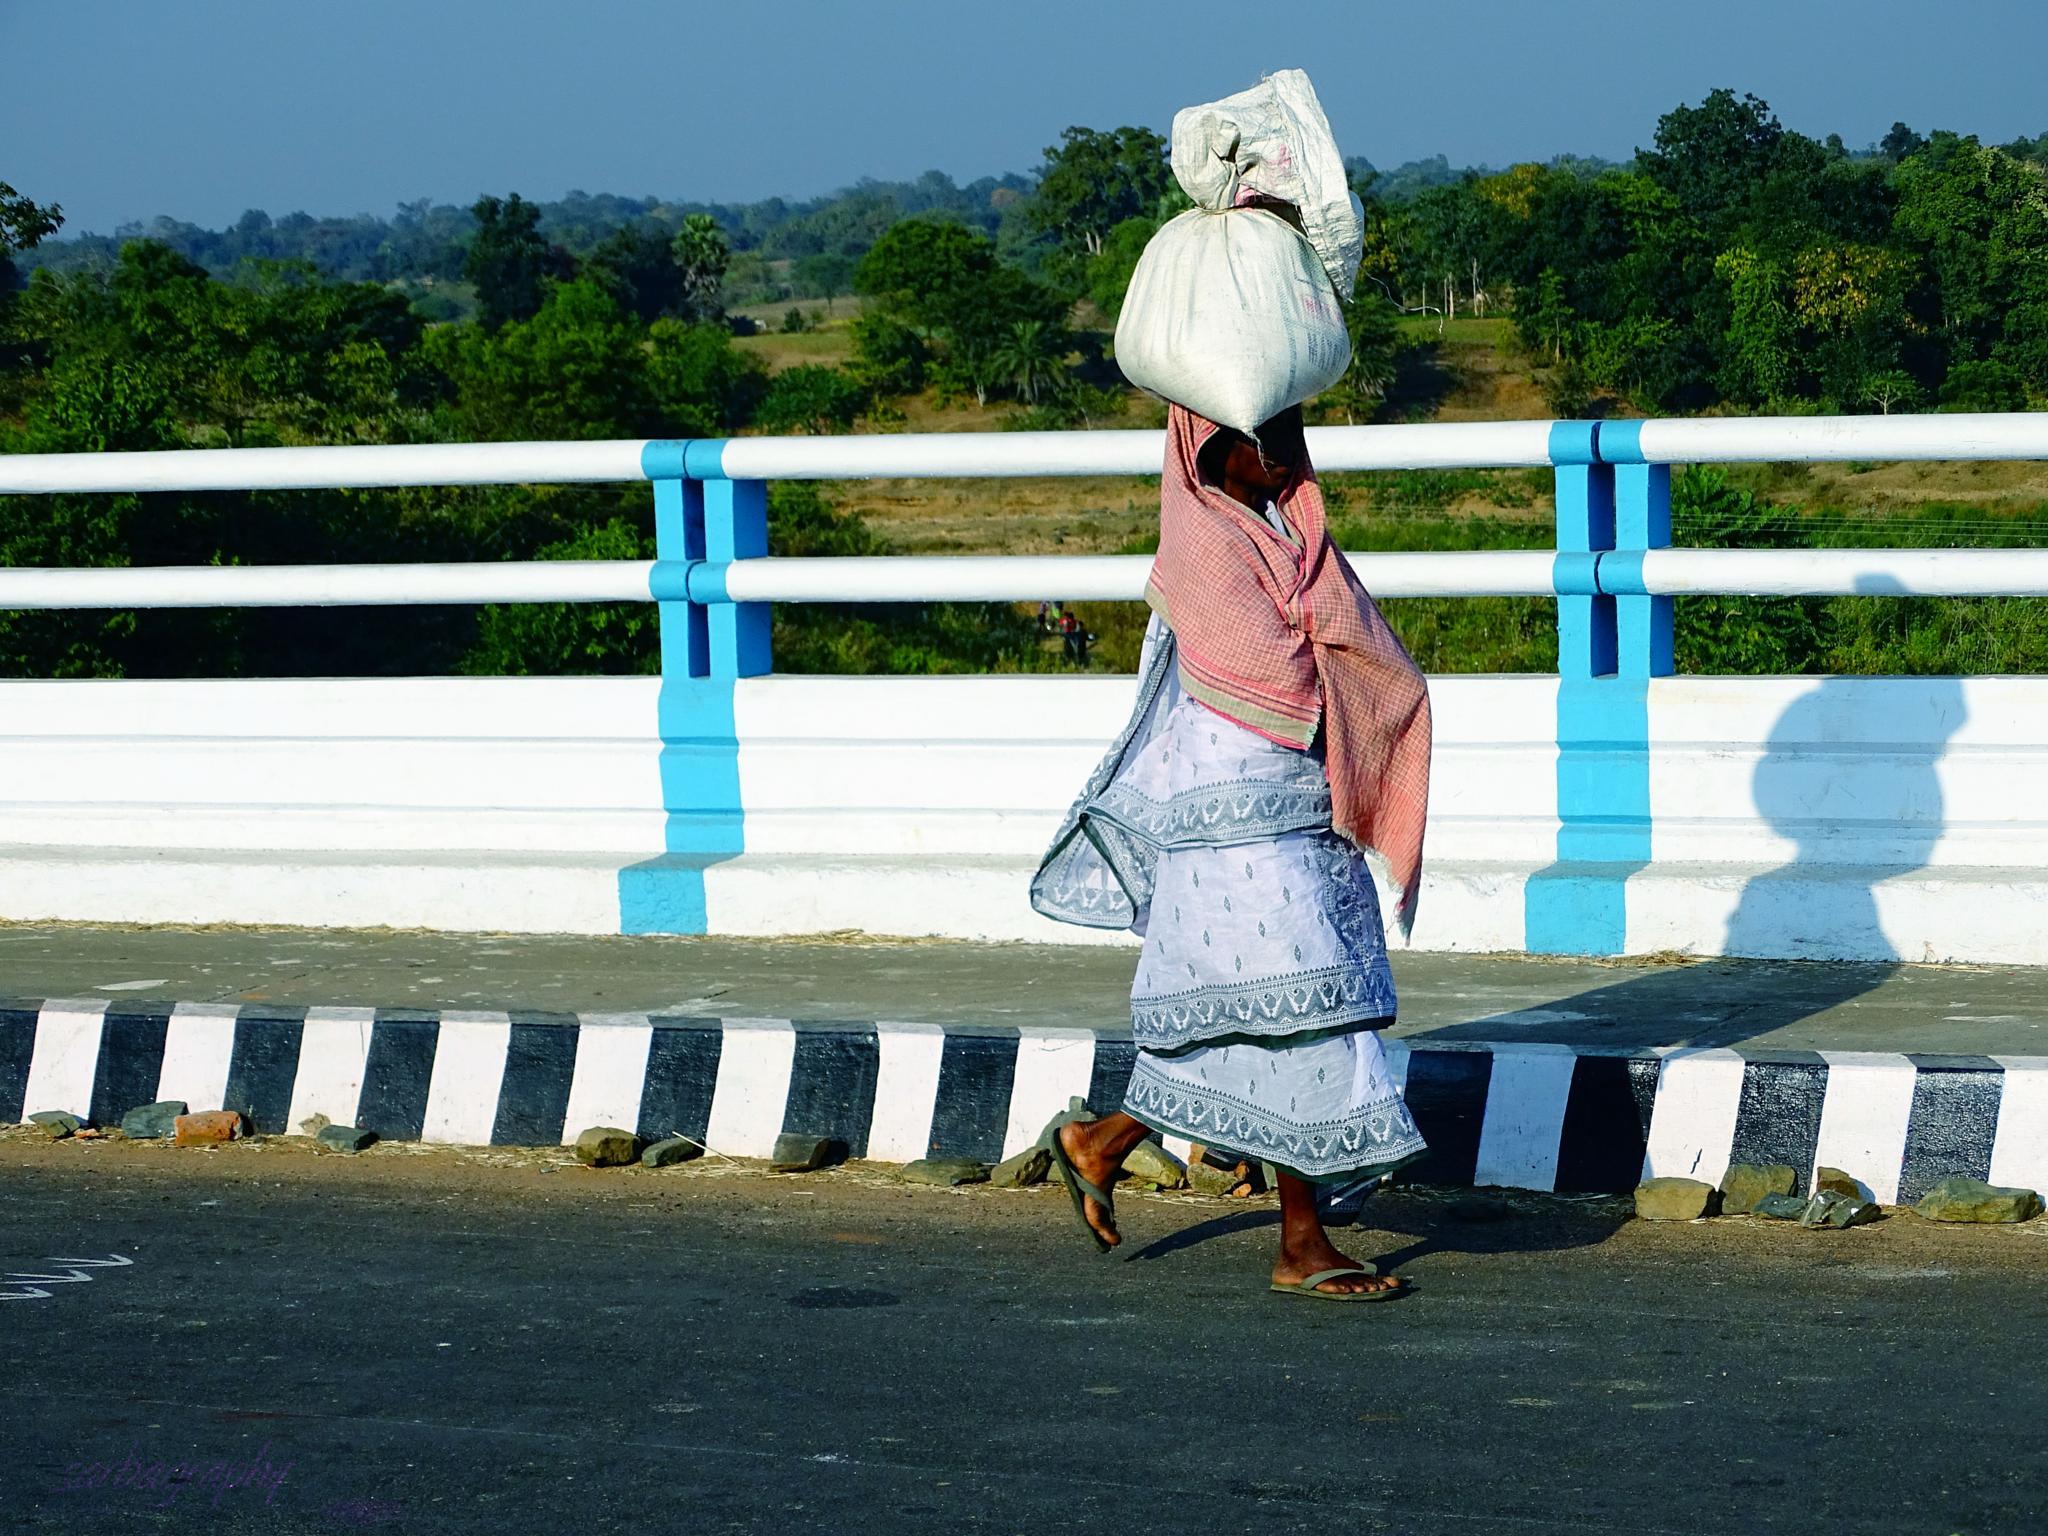 street life by Sarbajit Chatterjee